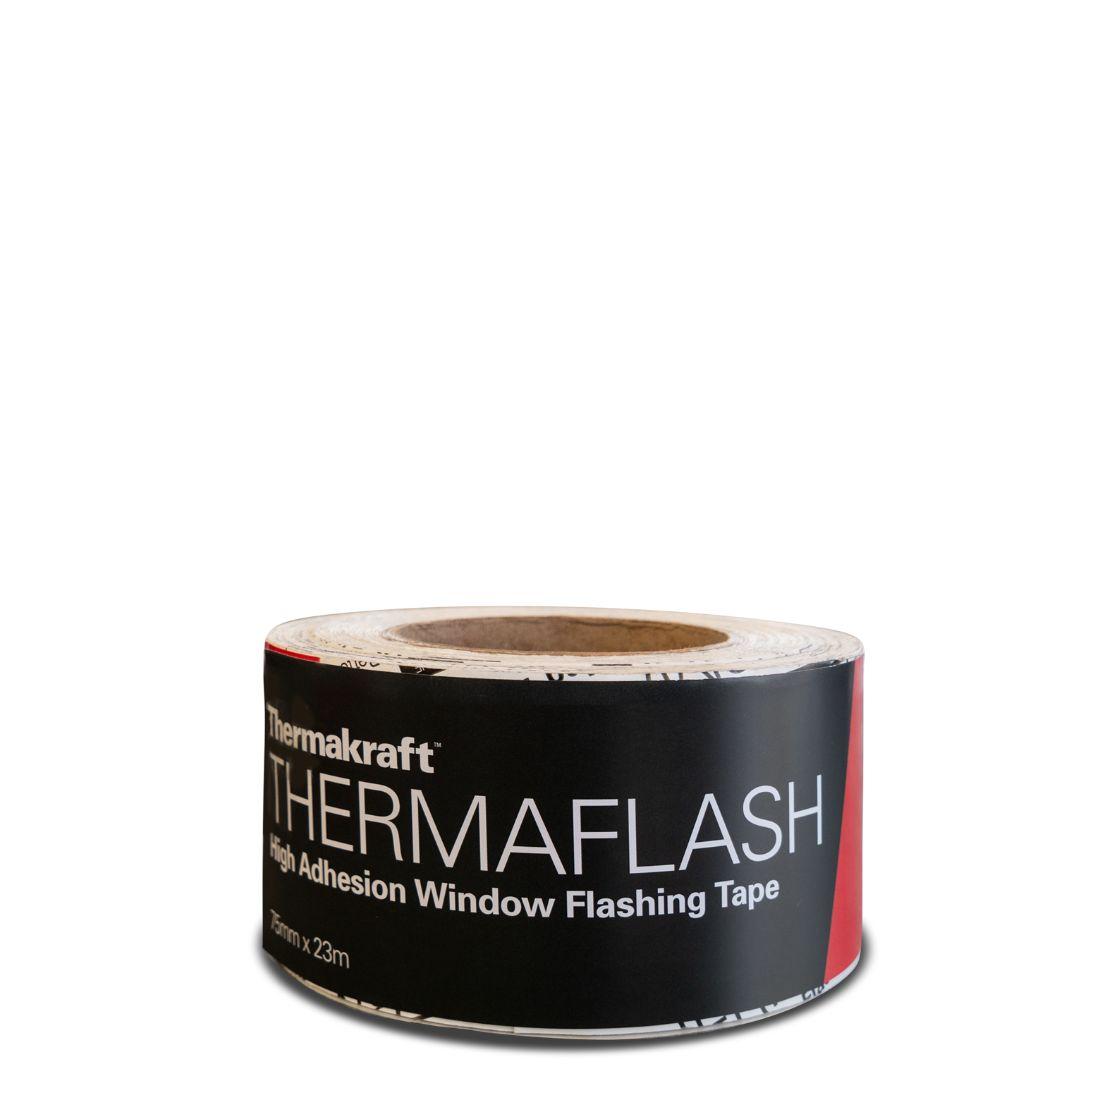 Thermaflash Window Flashing Tape 75mm x 23m